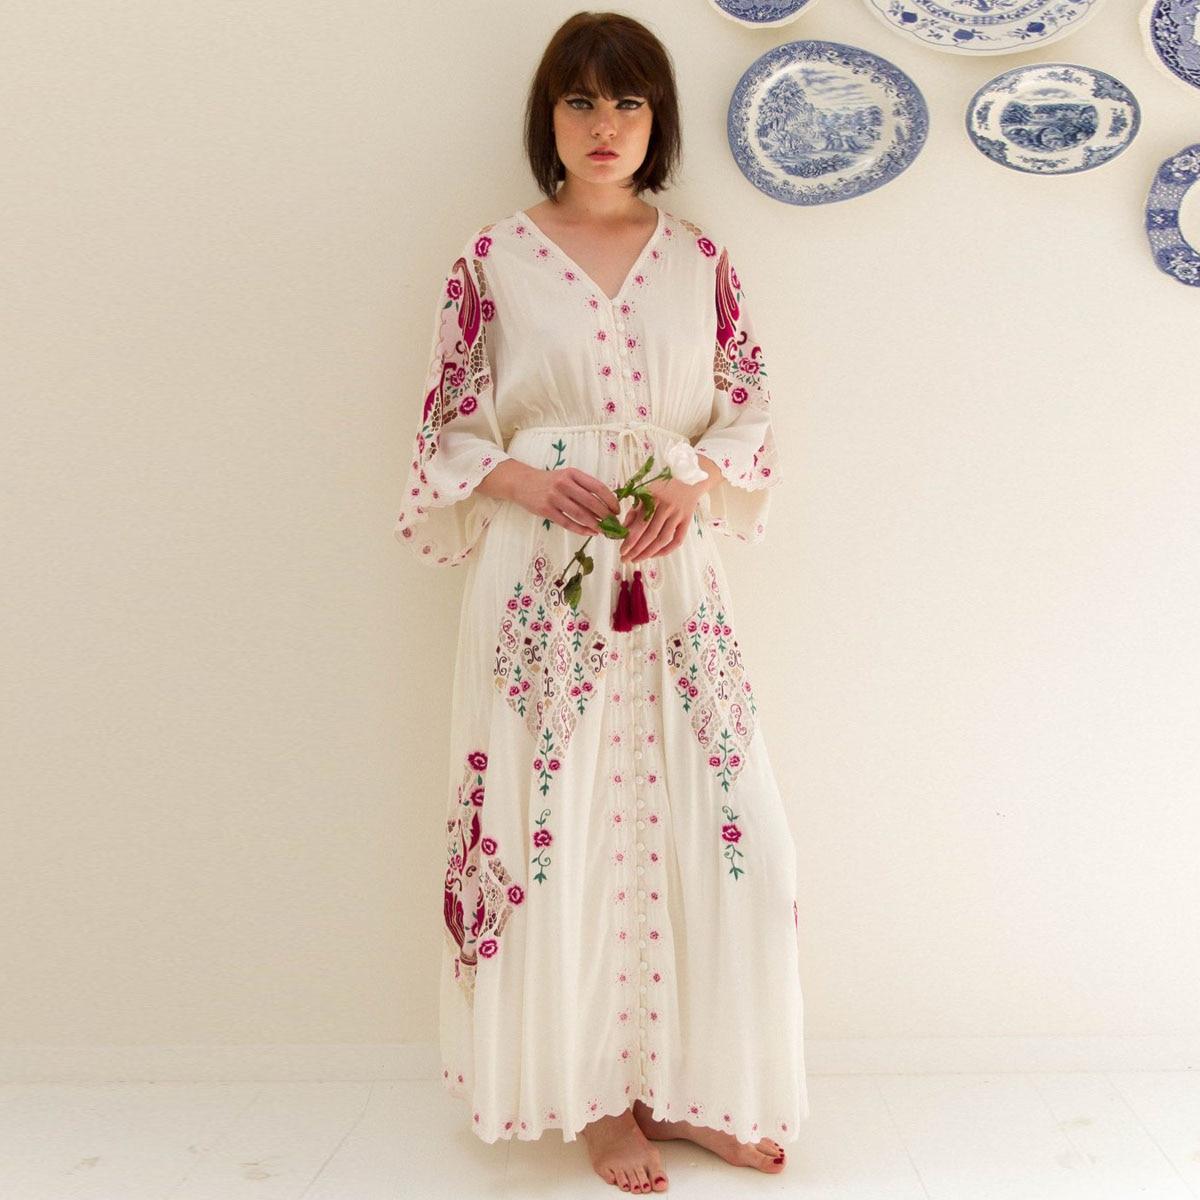 d90069c1811dc US $54.89 37% OFF|Jastie Floral Embroidered Boho Dress V Neck Batwing  Sleeve Women Dresses Loose Plus Size Long Maxi Dress Summer Dresses  Vestidos-in ...